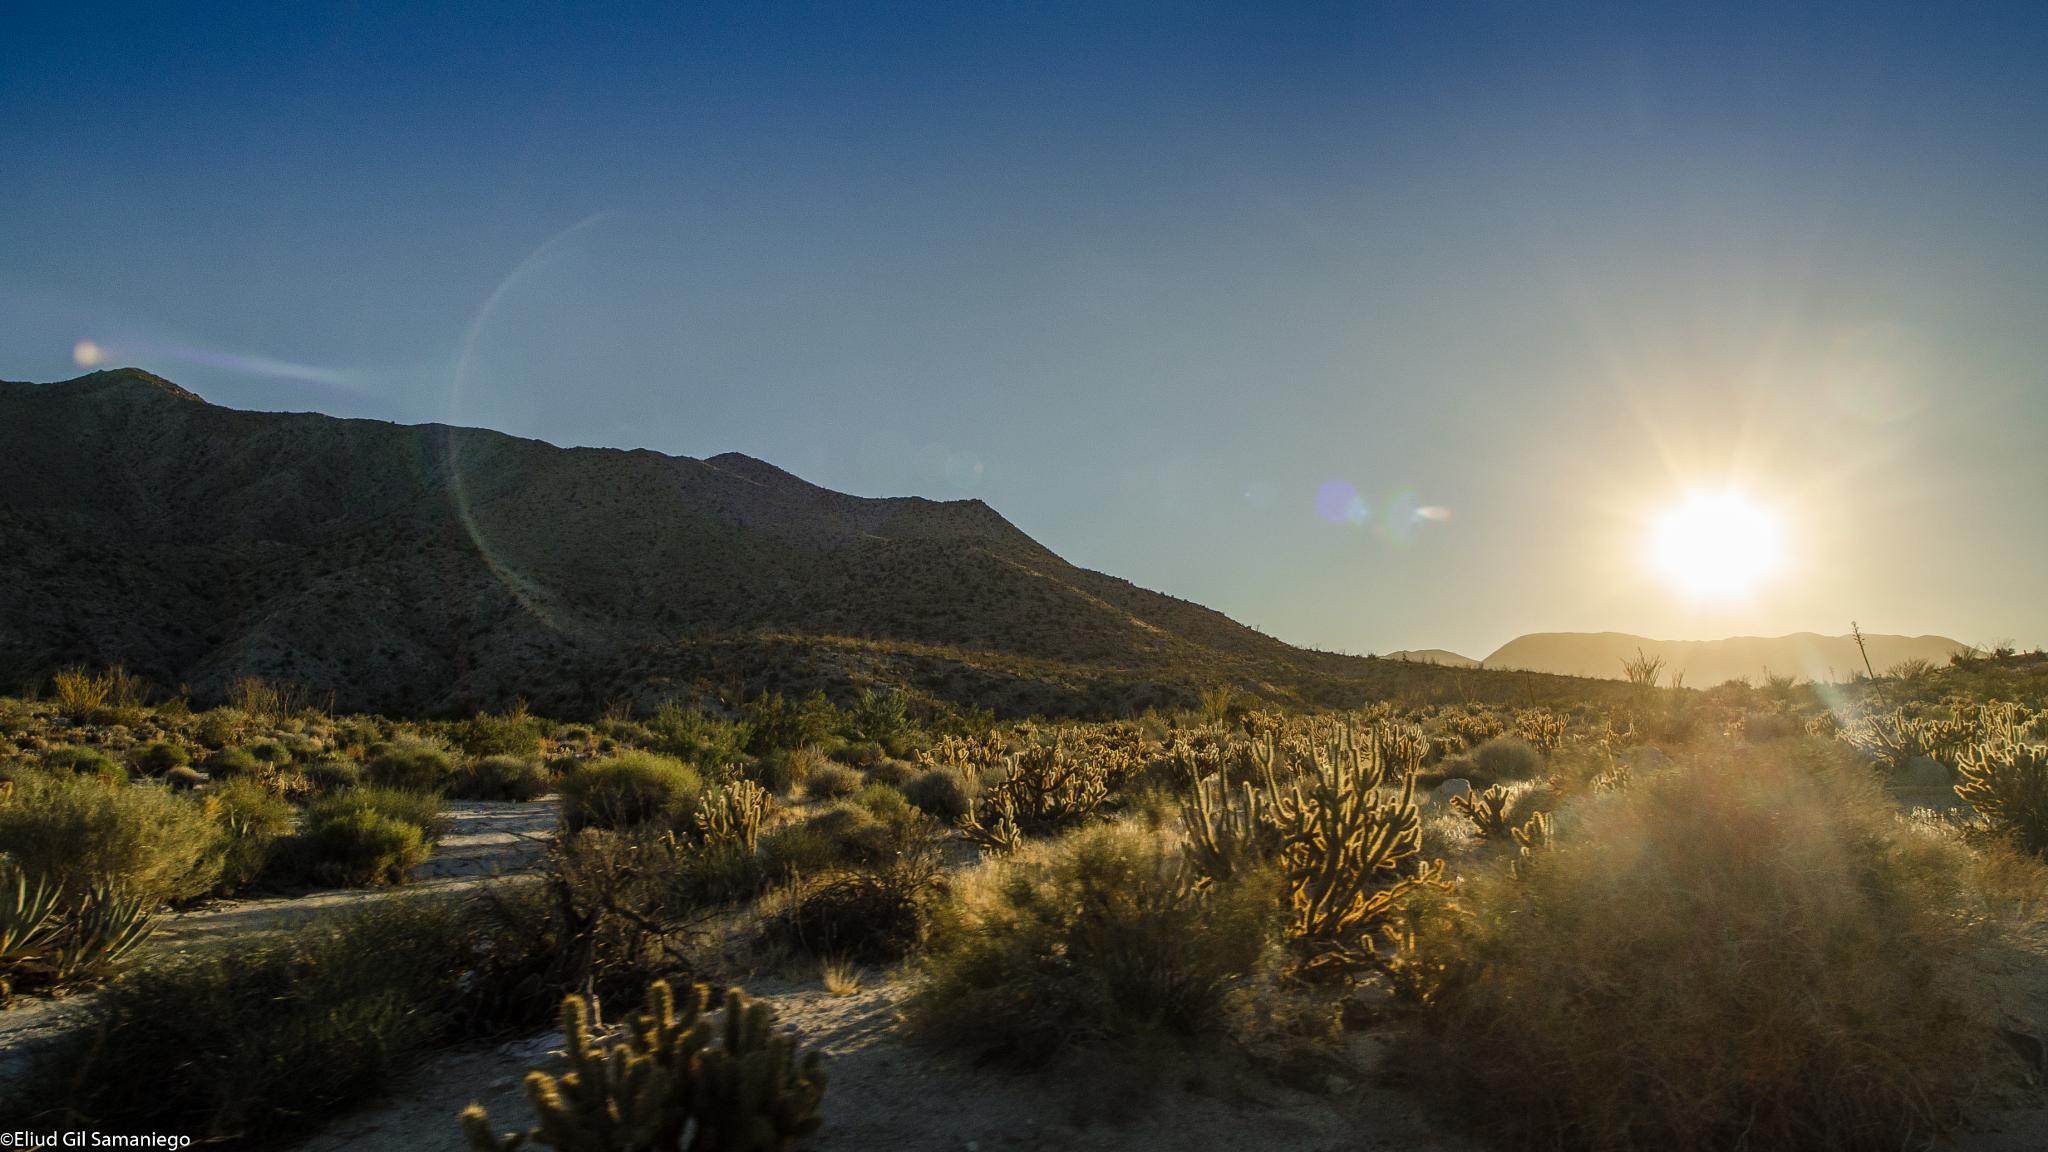 Sunset in the desert by David Eliud Gil Samaniego Maldonado